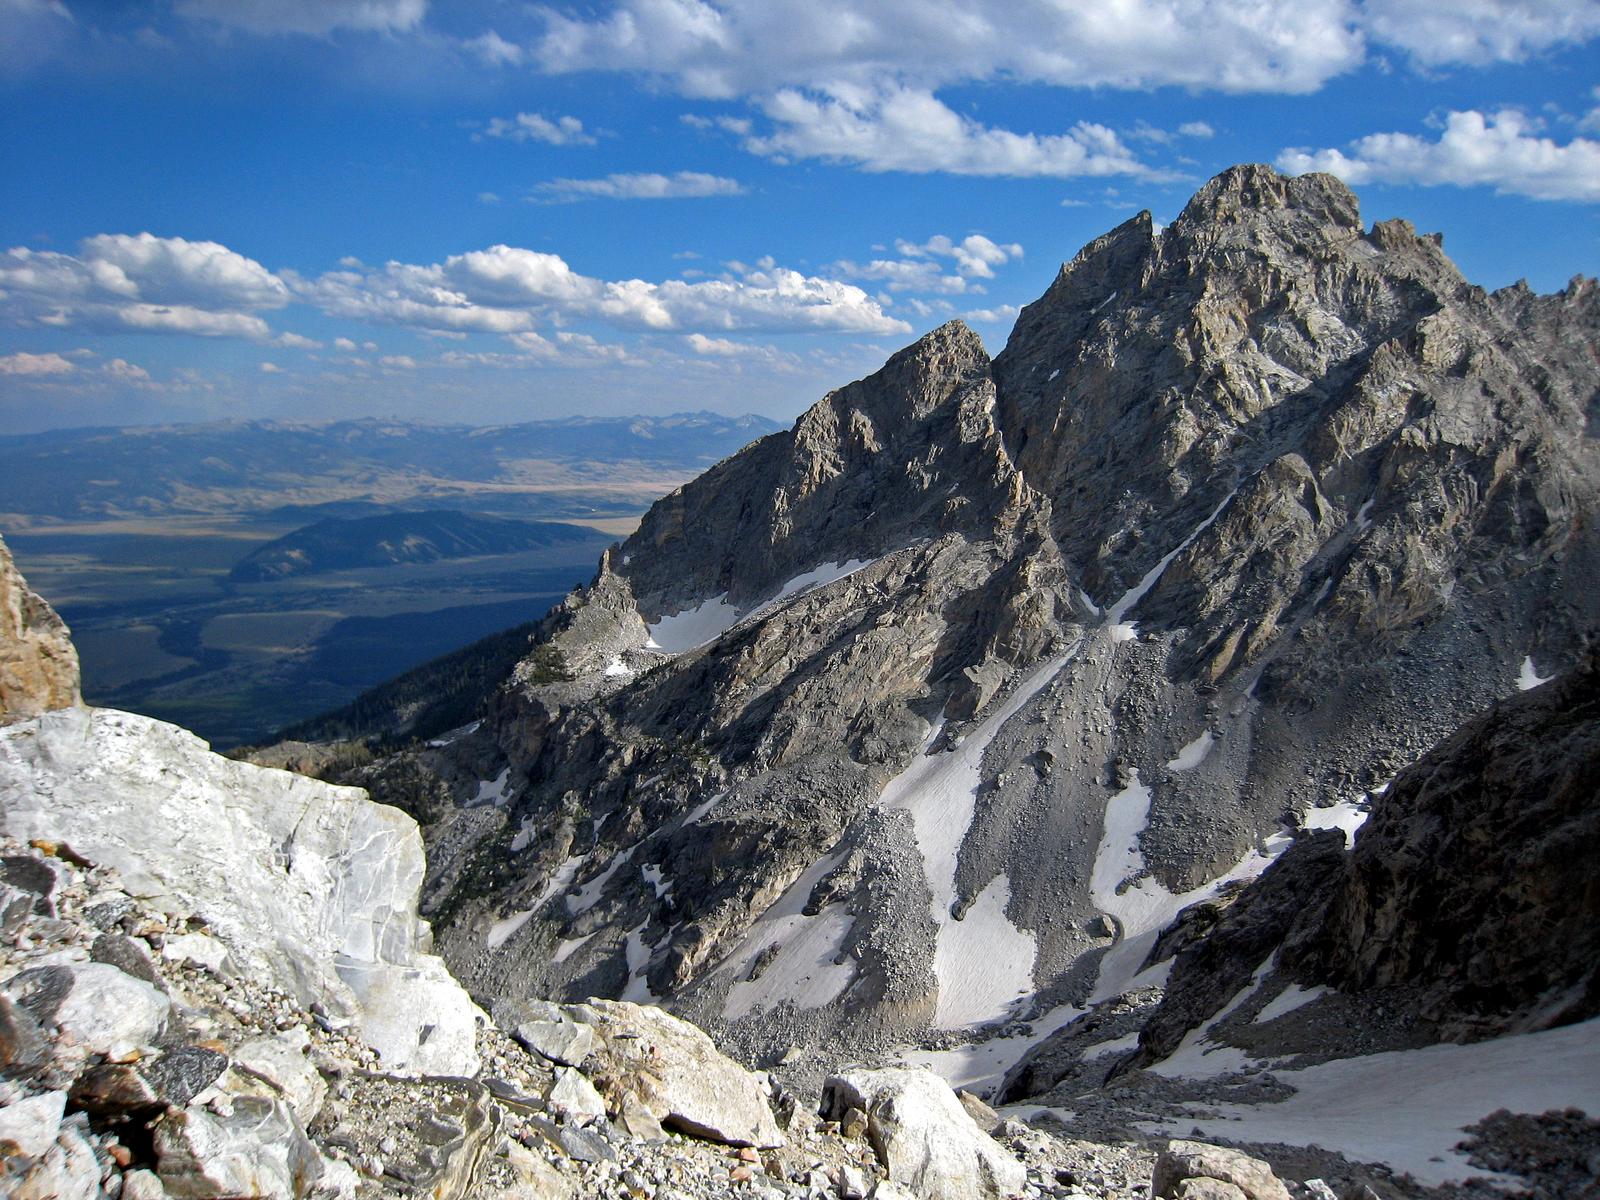 view south to Nez Perce from Grand Teton base camp, Grand Teton National Park, Wyoming